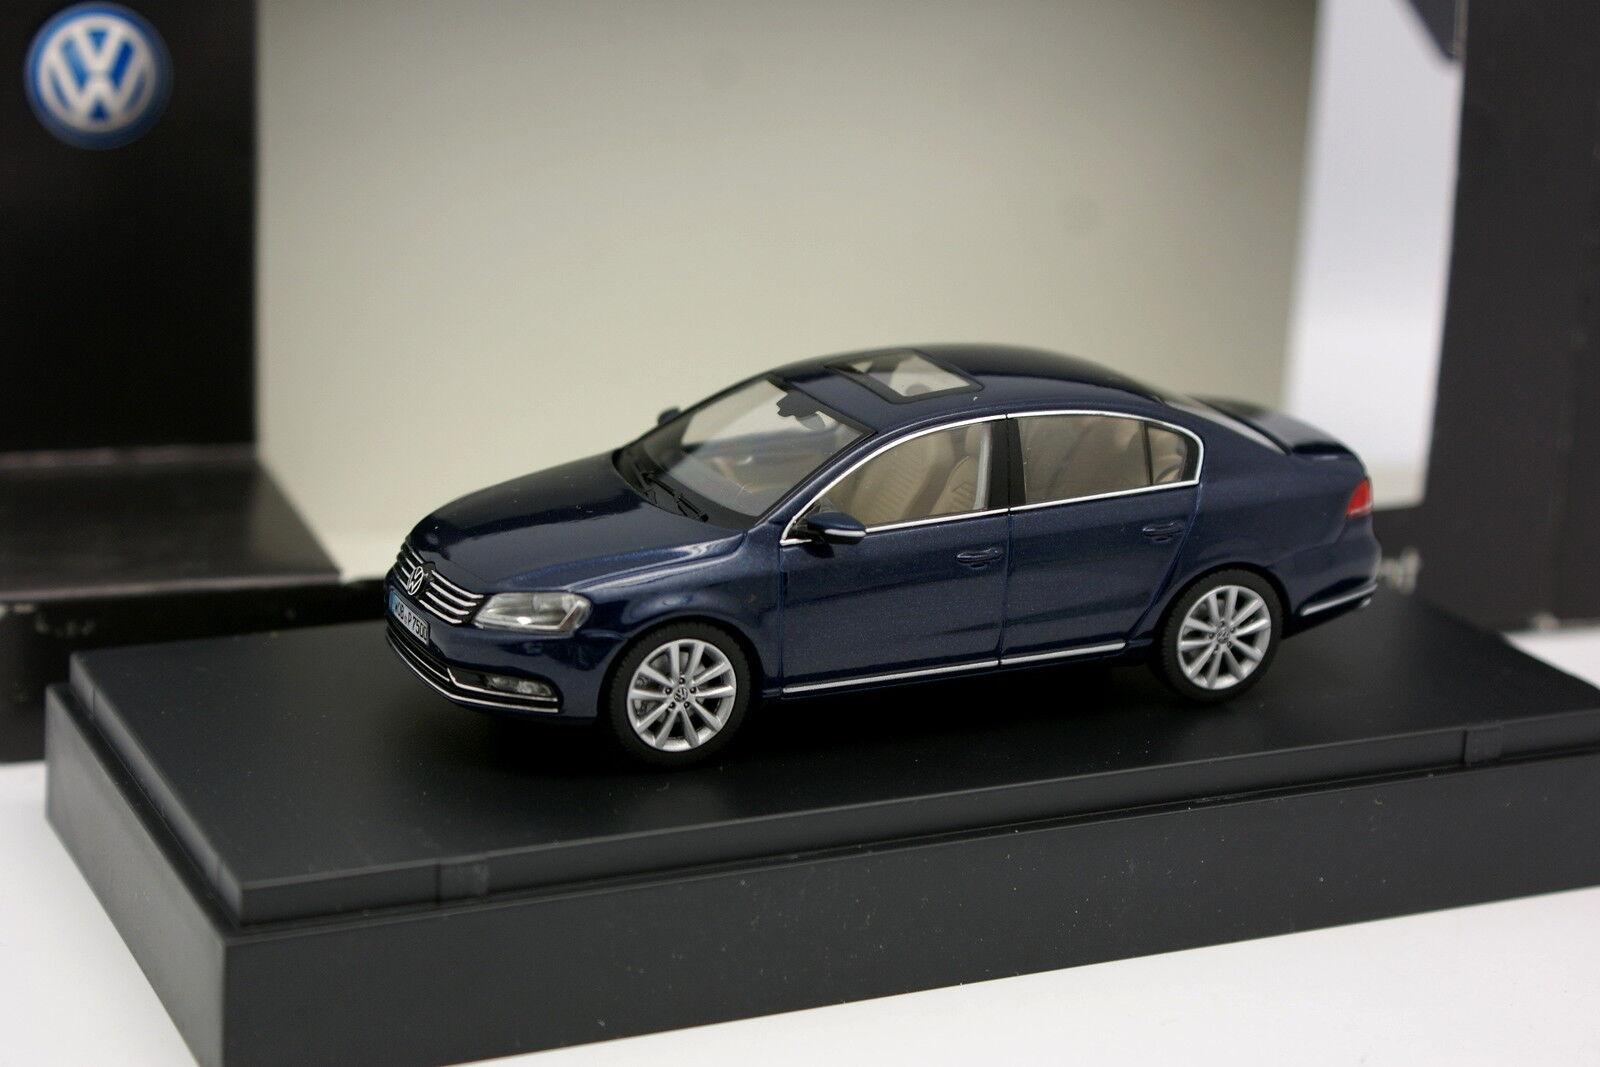 Schuco 1 43 43 43 - VW Passat Bleue 52ff47